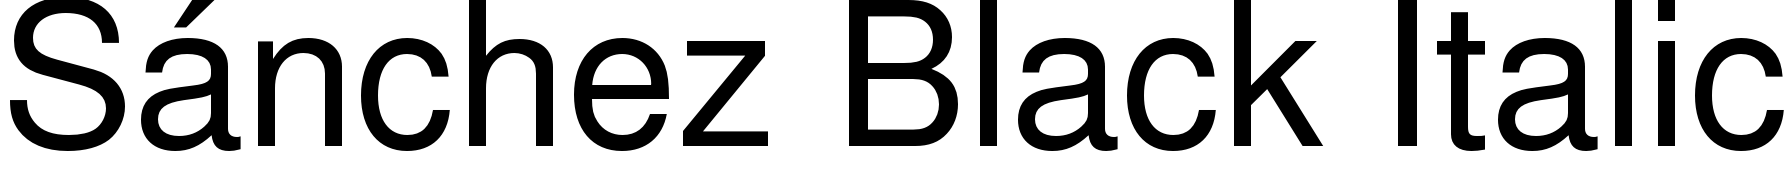 Sánchez Black Italic